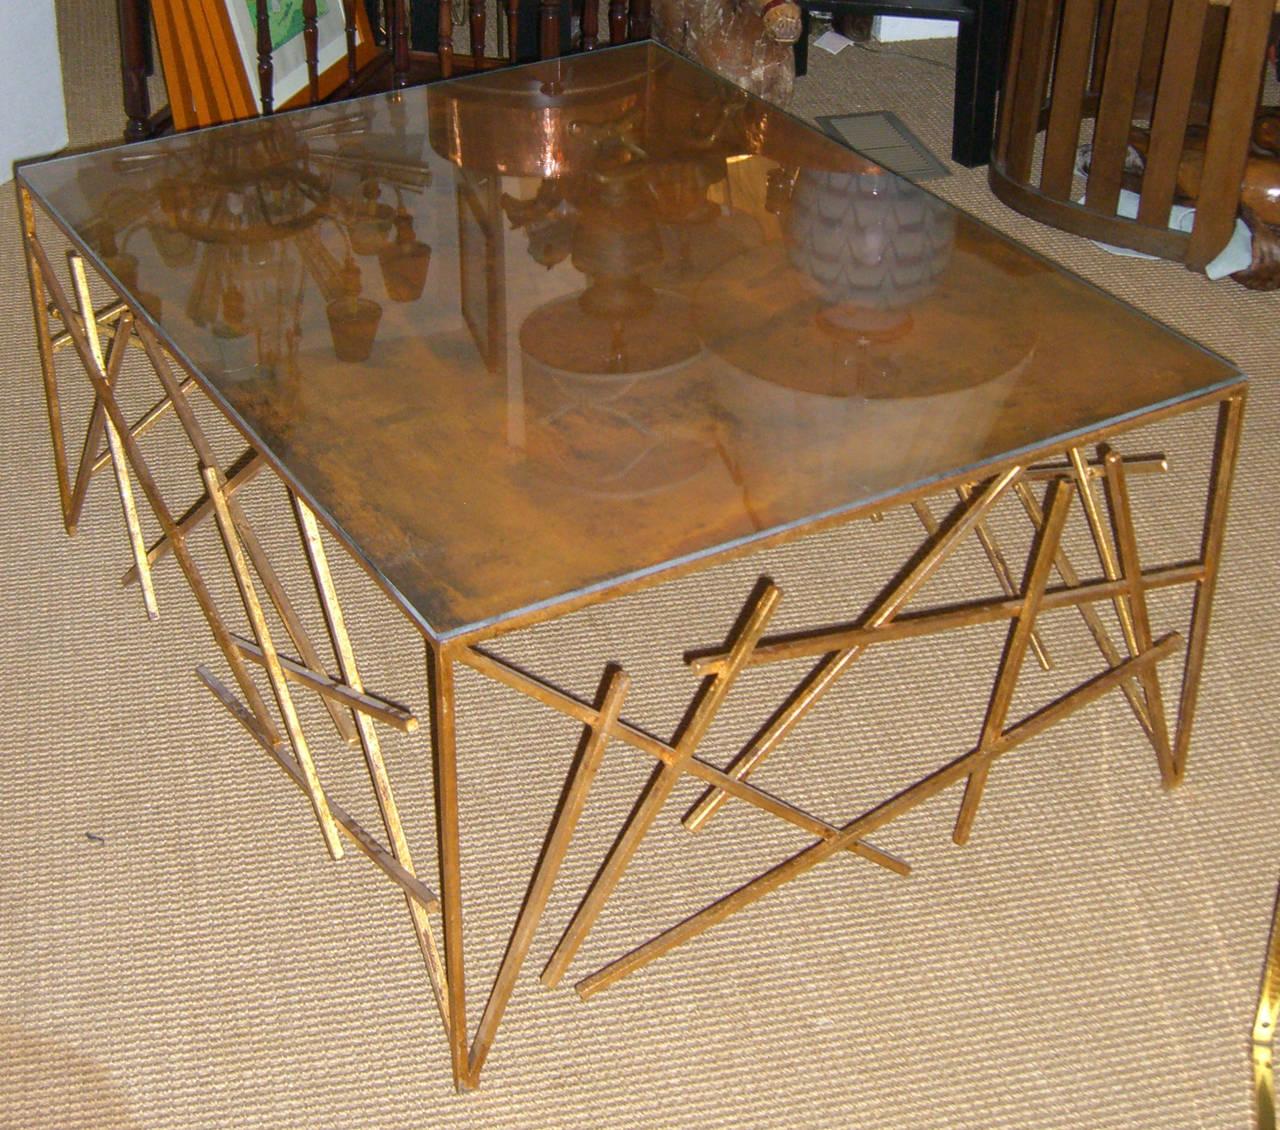 Custom Metal Criss-Cross Design Cocktail Table 3